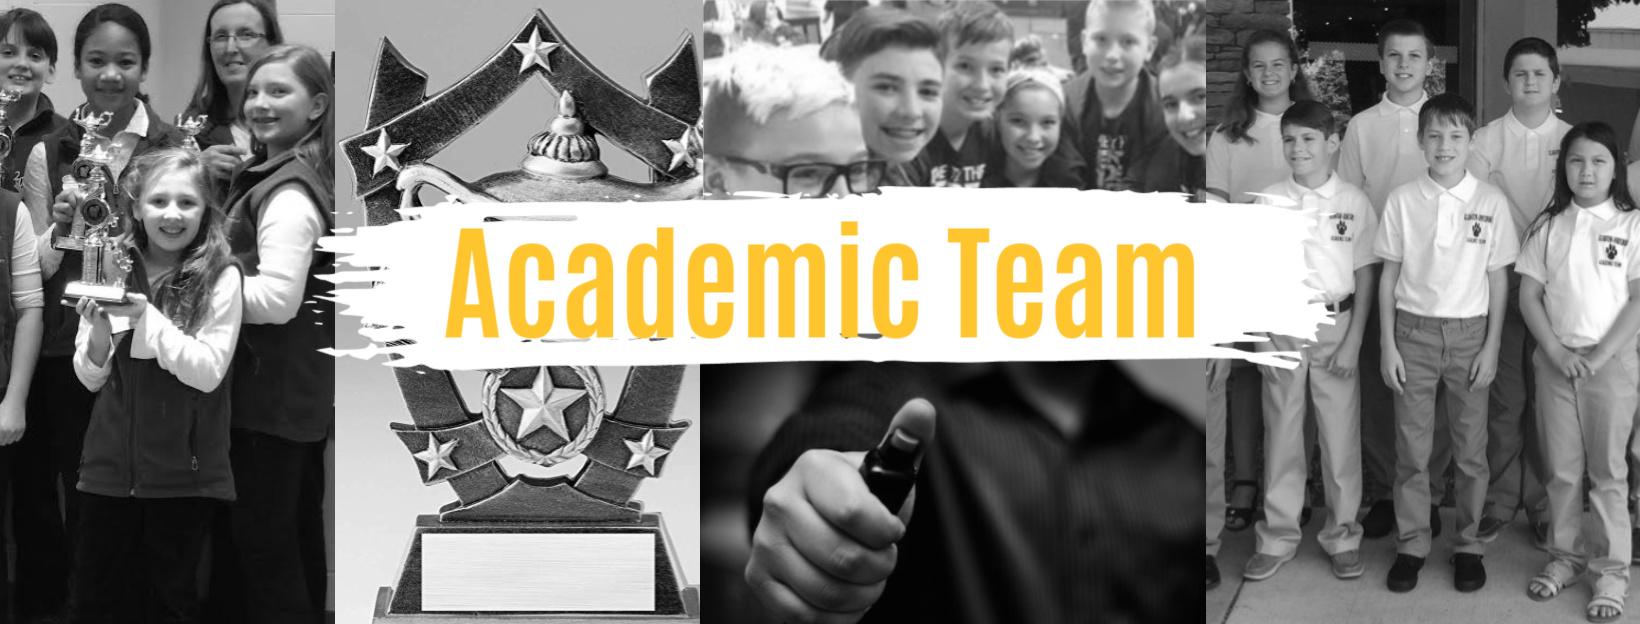 academic team banner